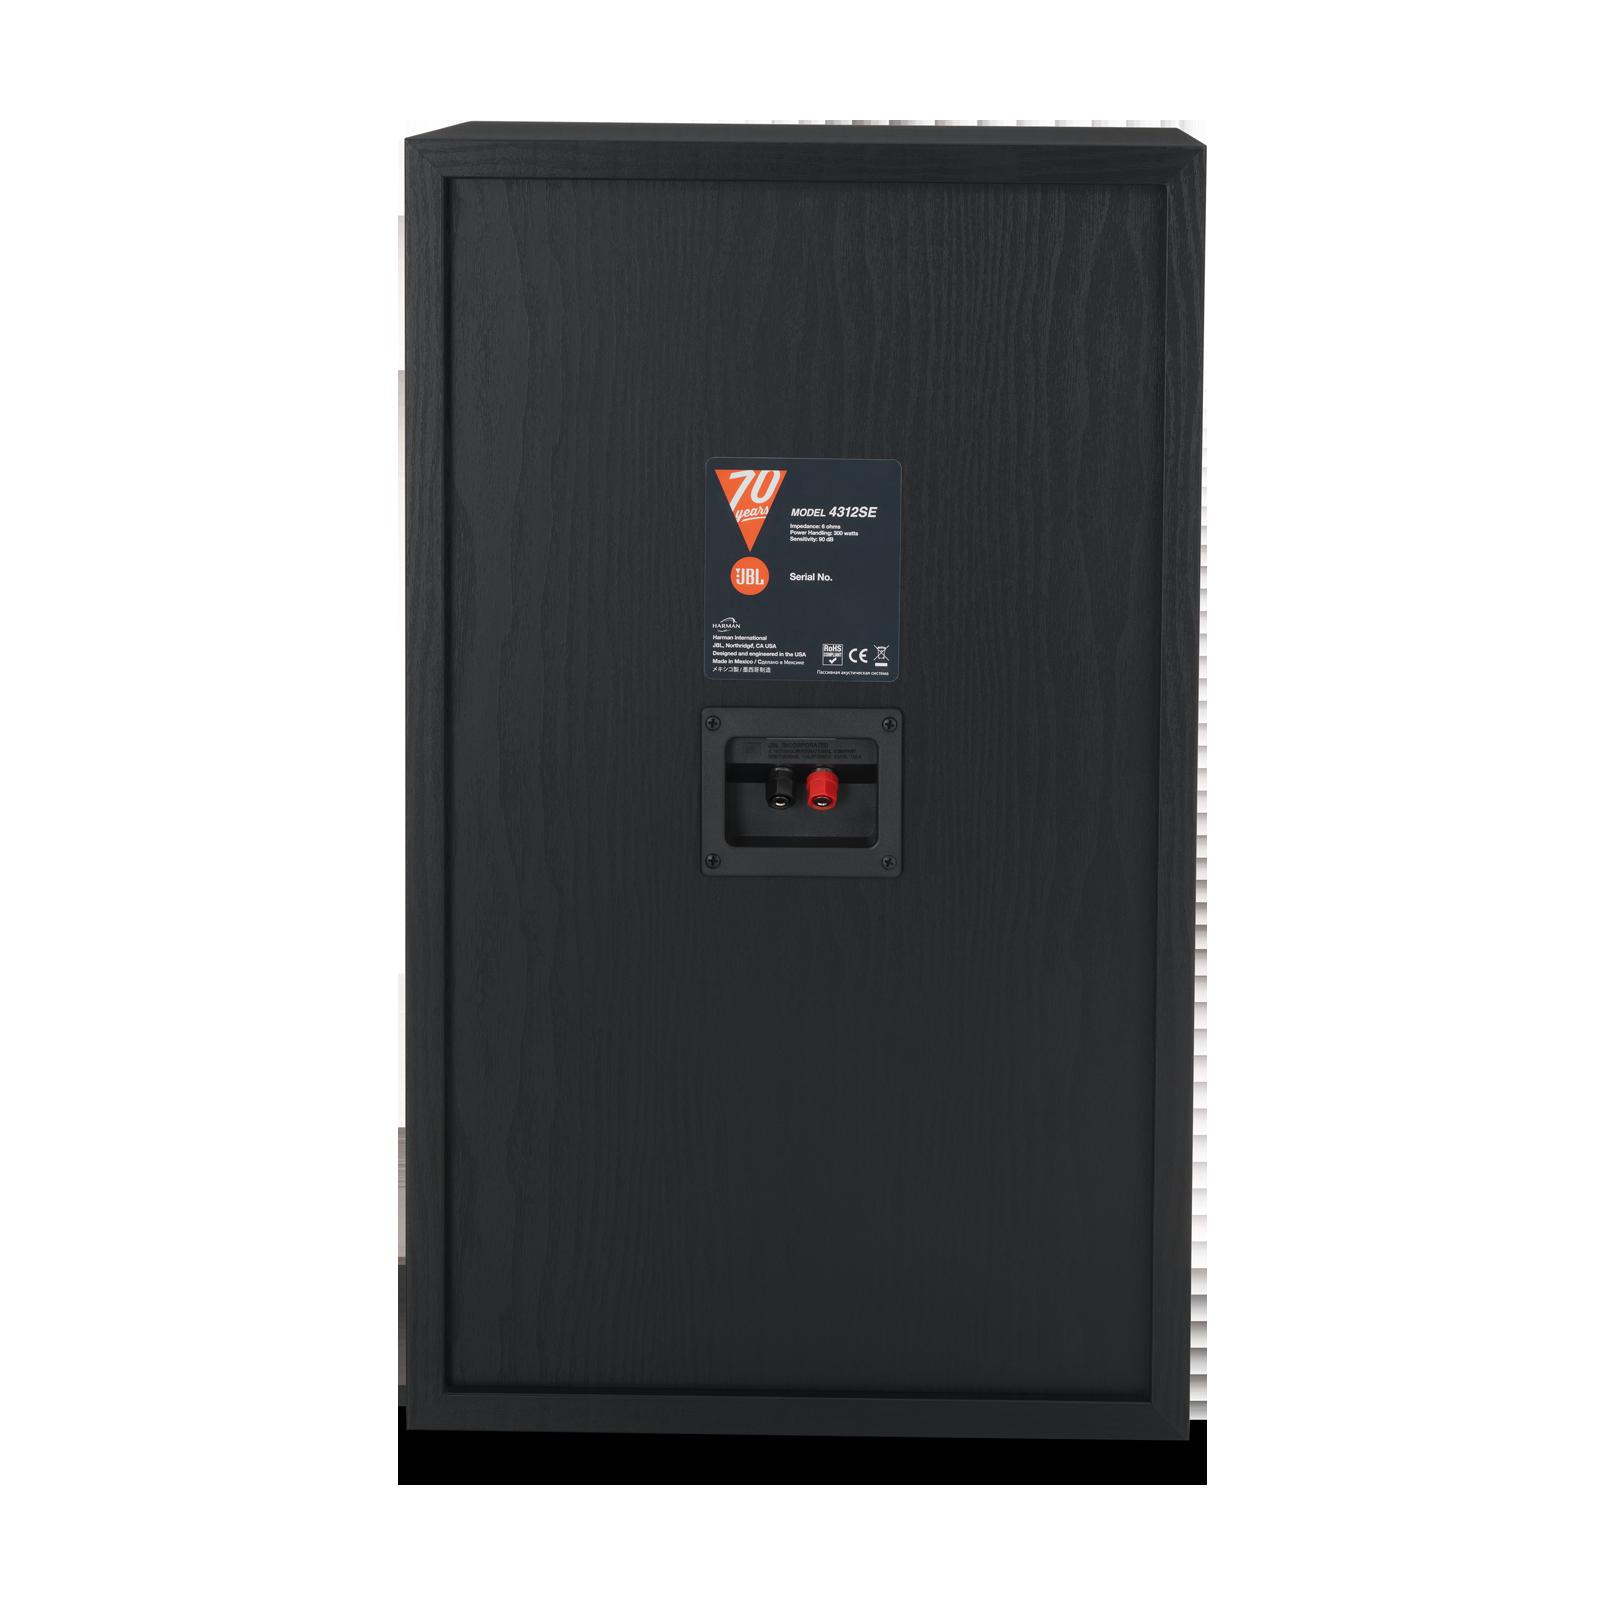 4312SE - Black - JBL 4312SE Studio Monitor Bookshelf Loudspeaker - Back